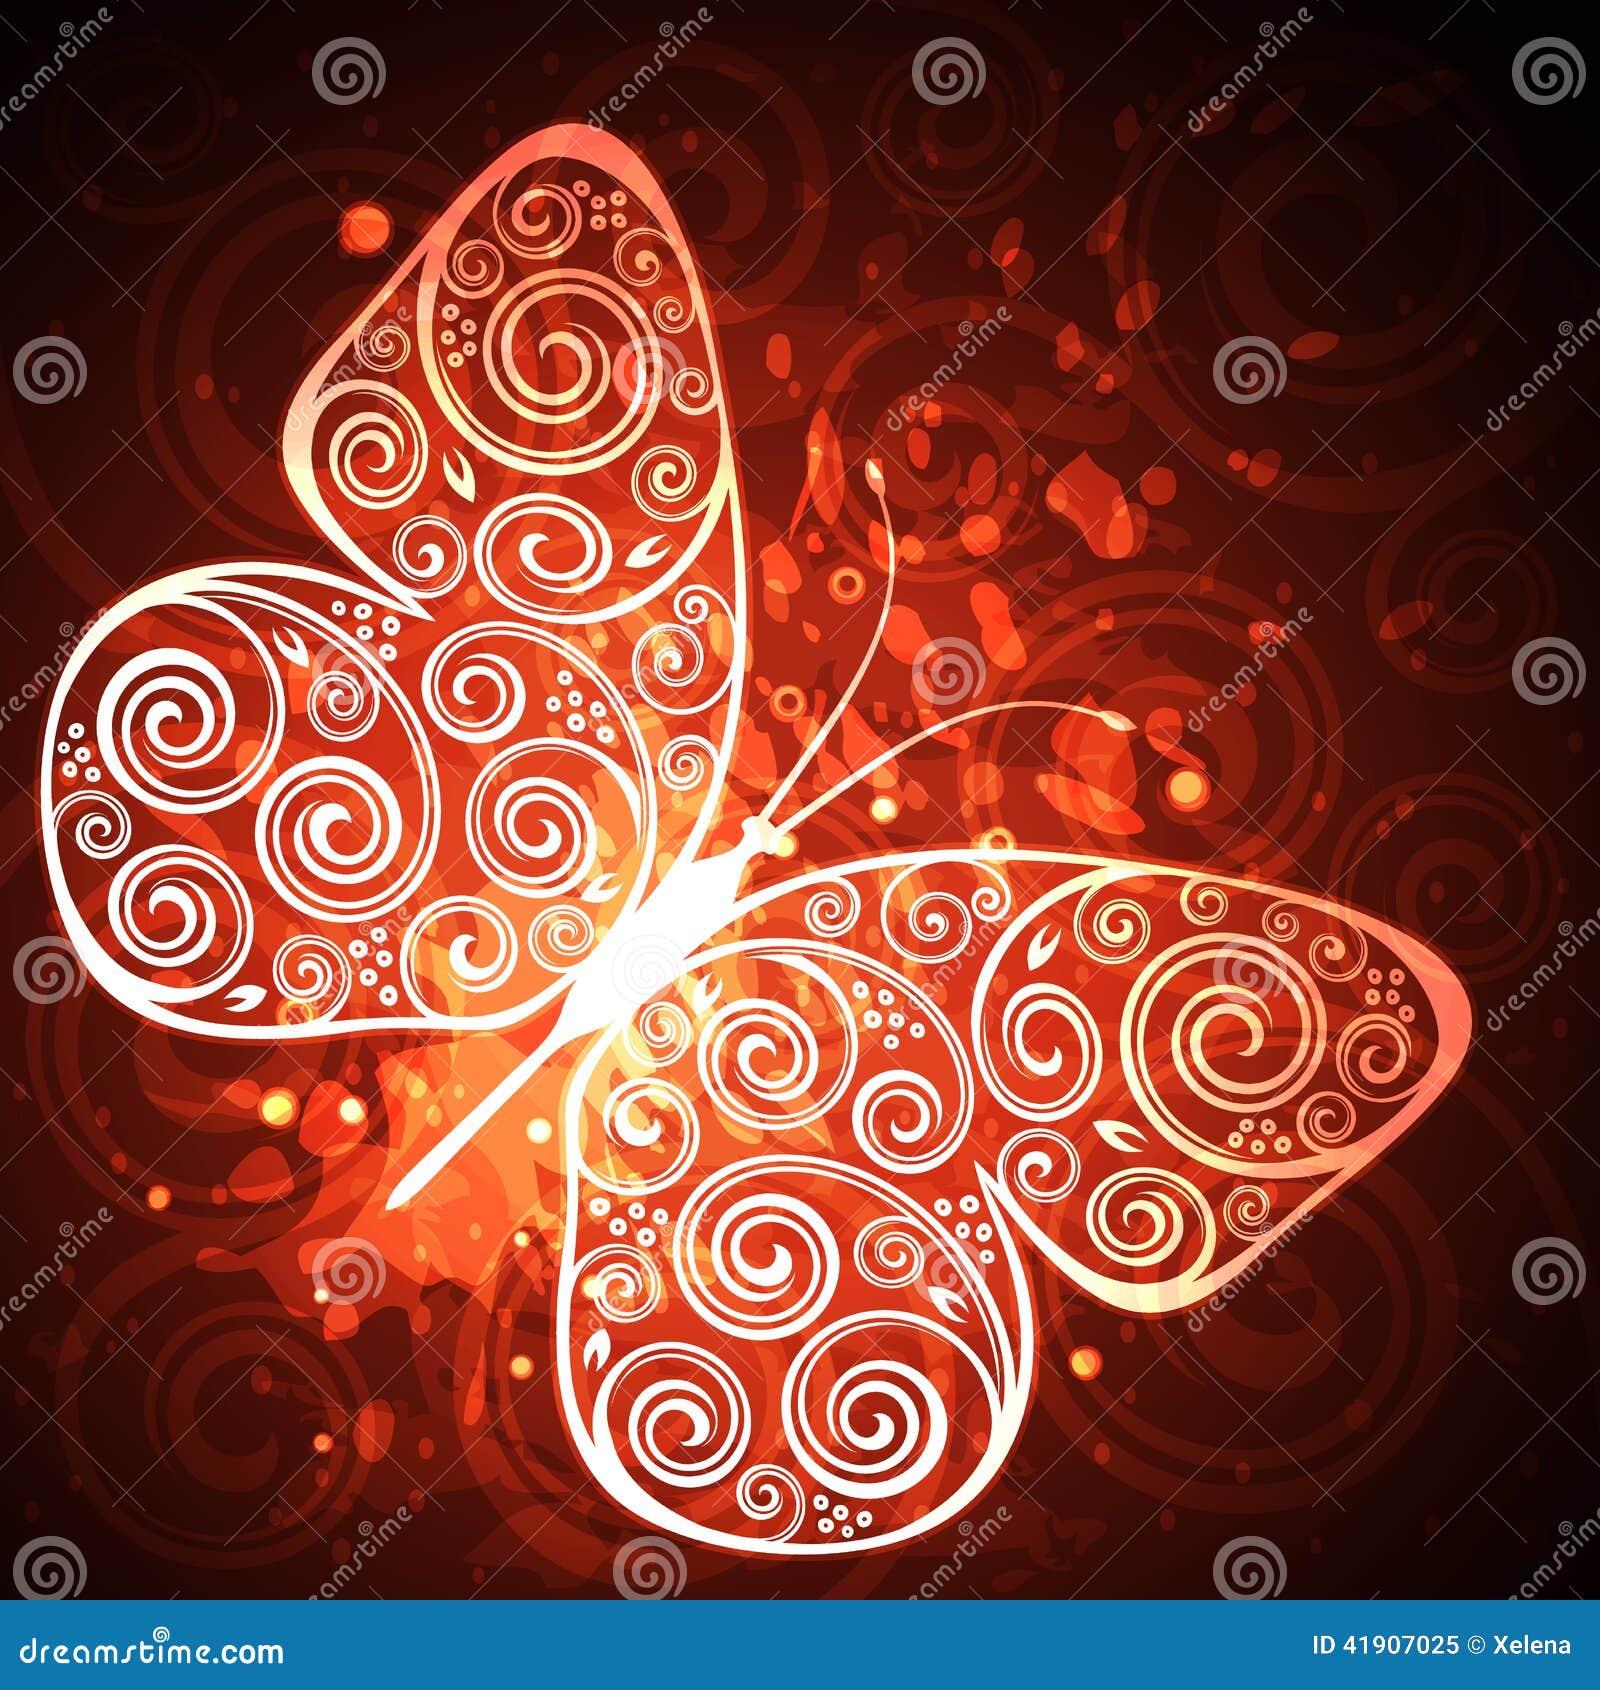 Mariposa floral